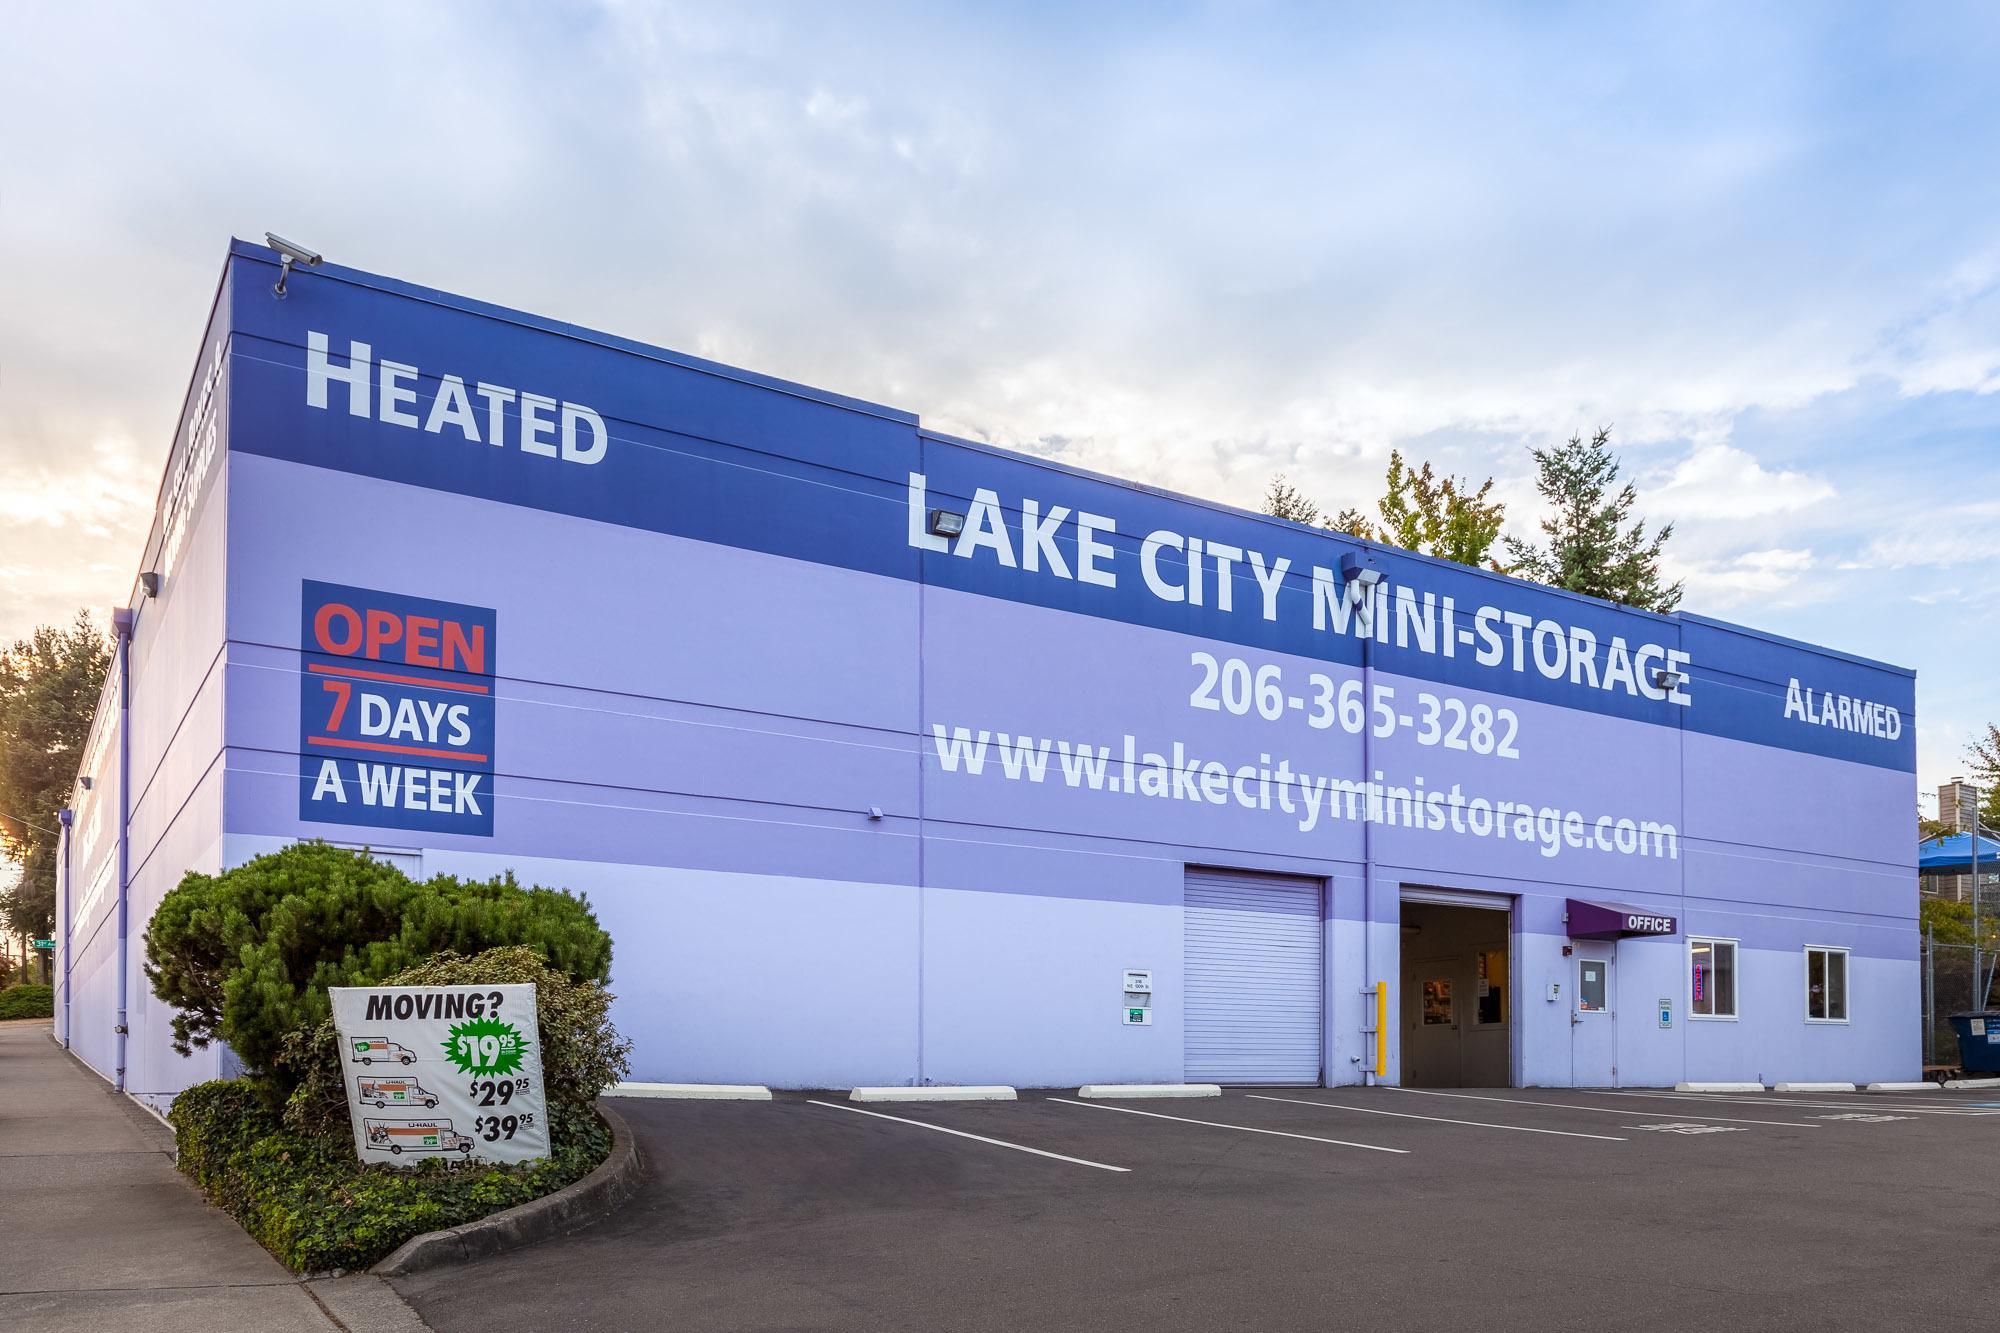 Exterior of self storage facility in Seattle, Washington